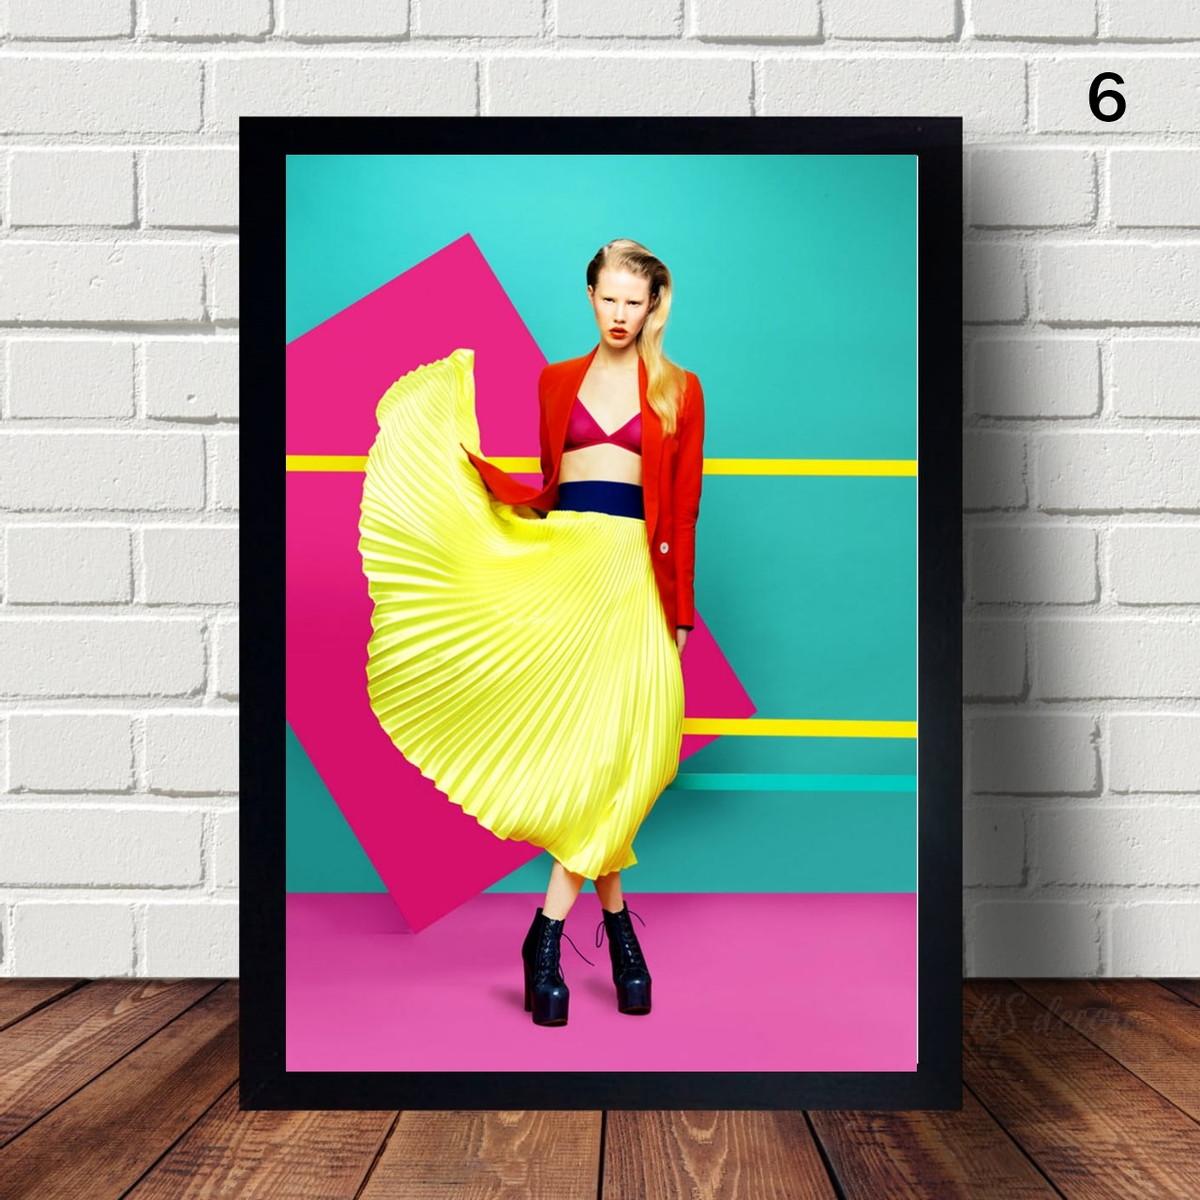 Quadro Poster De Moda Fashion A3 No Elo7 Rsdecor 1067949